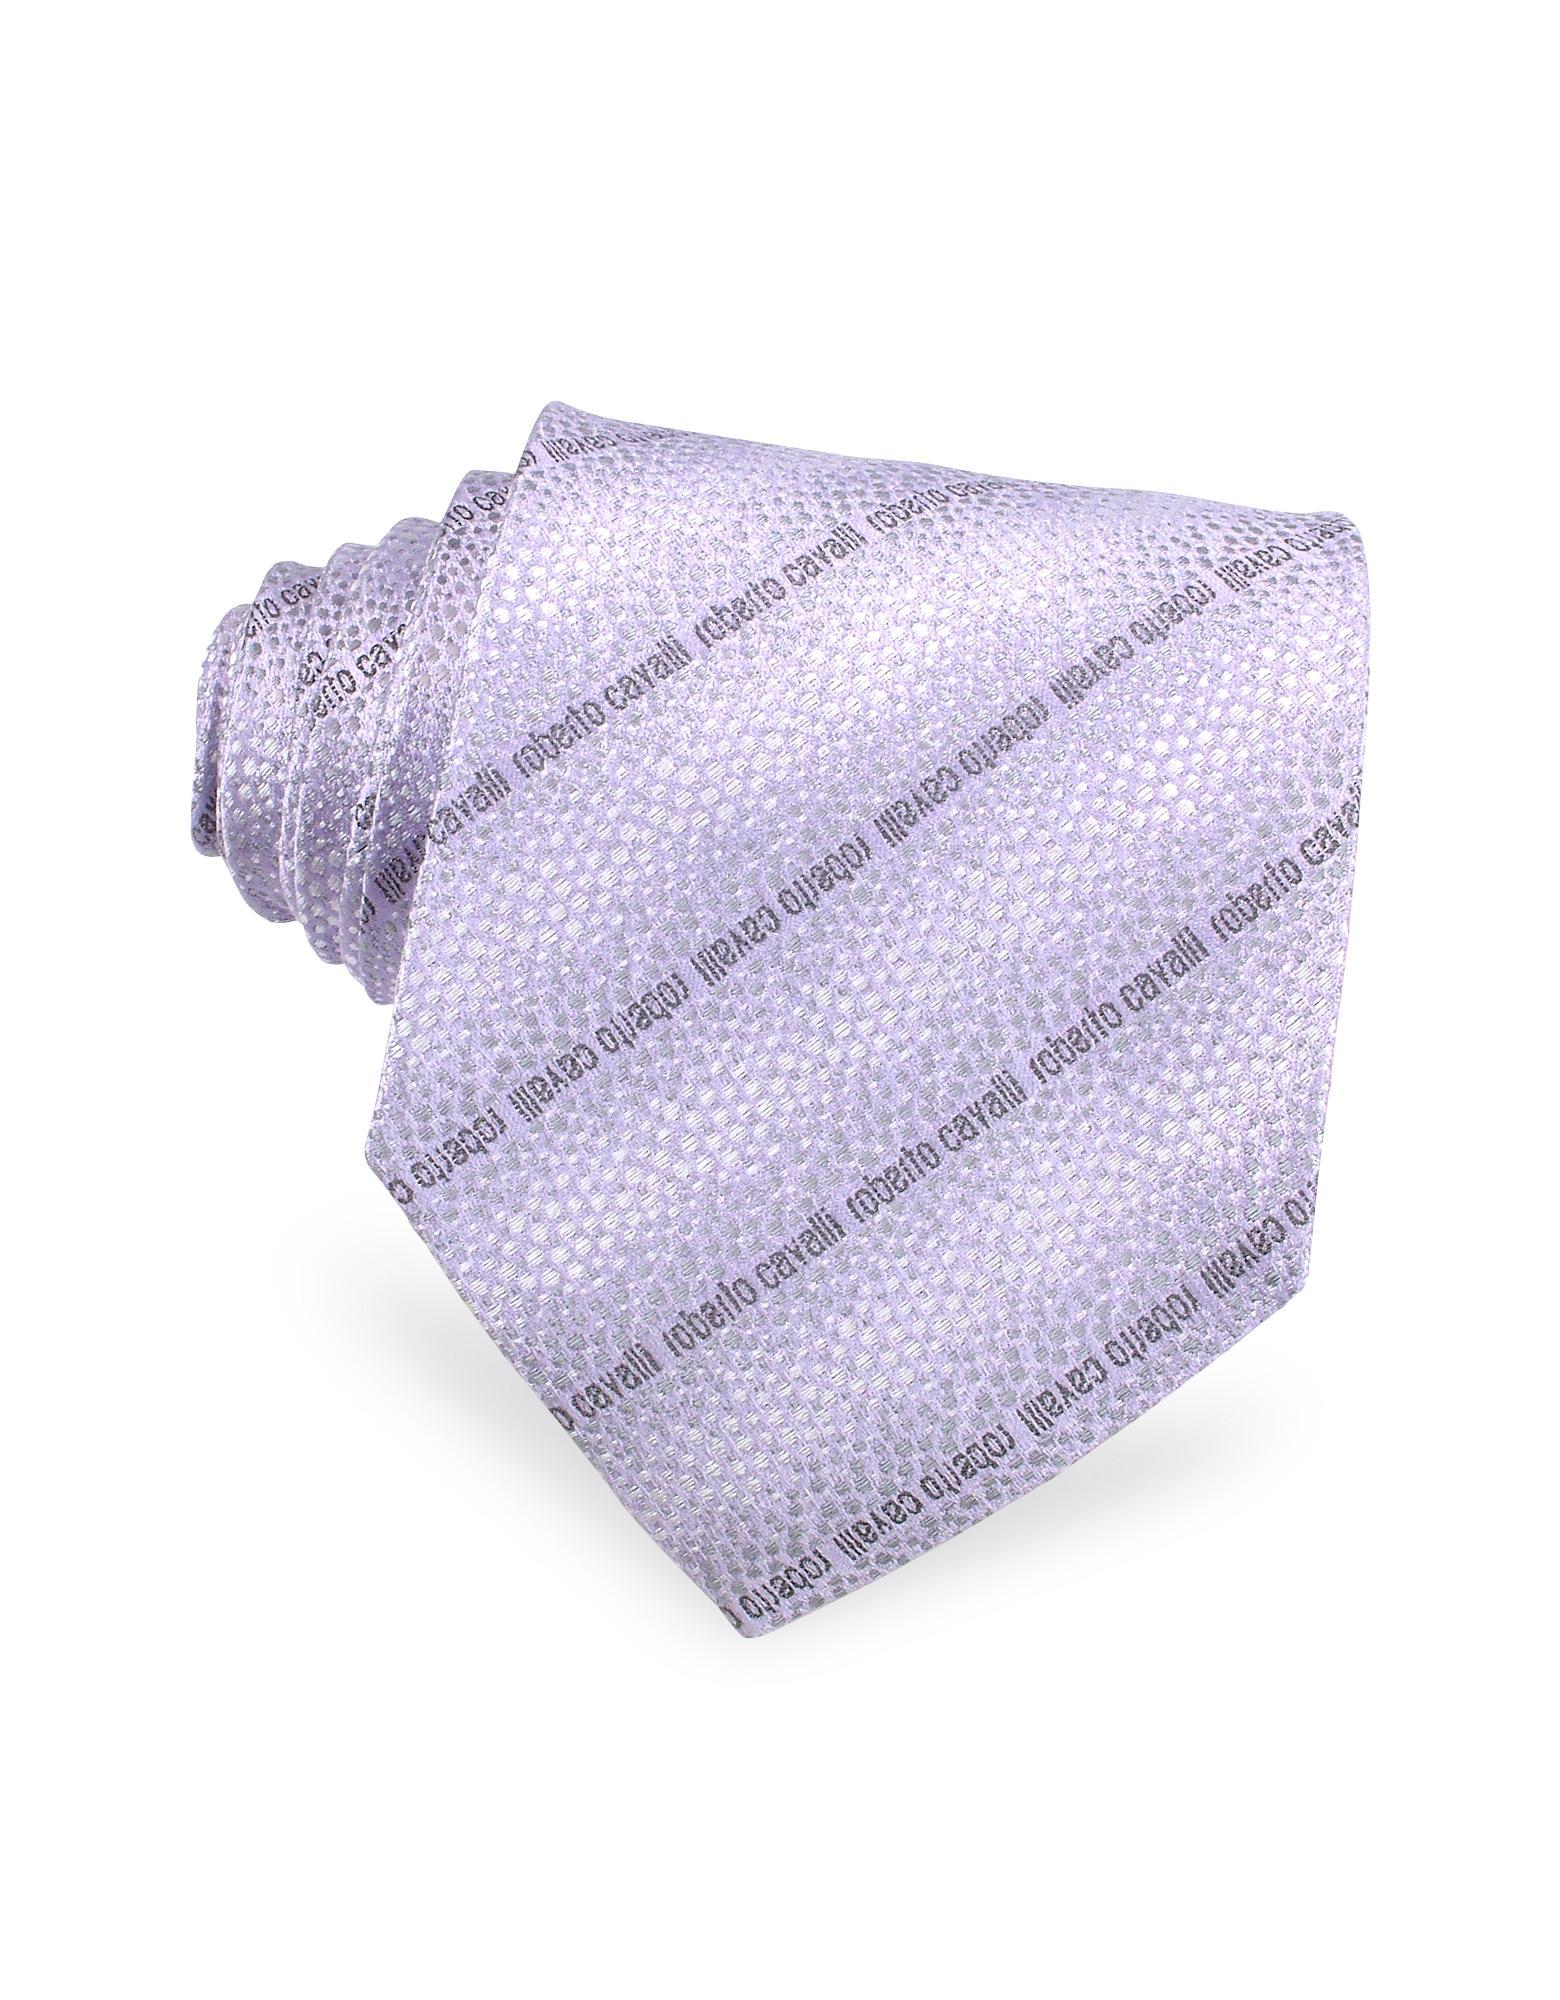 Roberto Cavalli  Signature Lines Woven Silk Tie